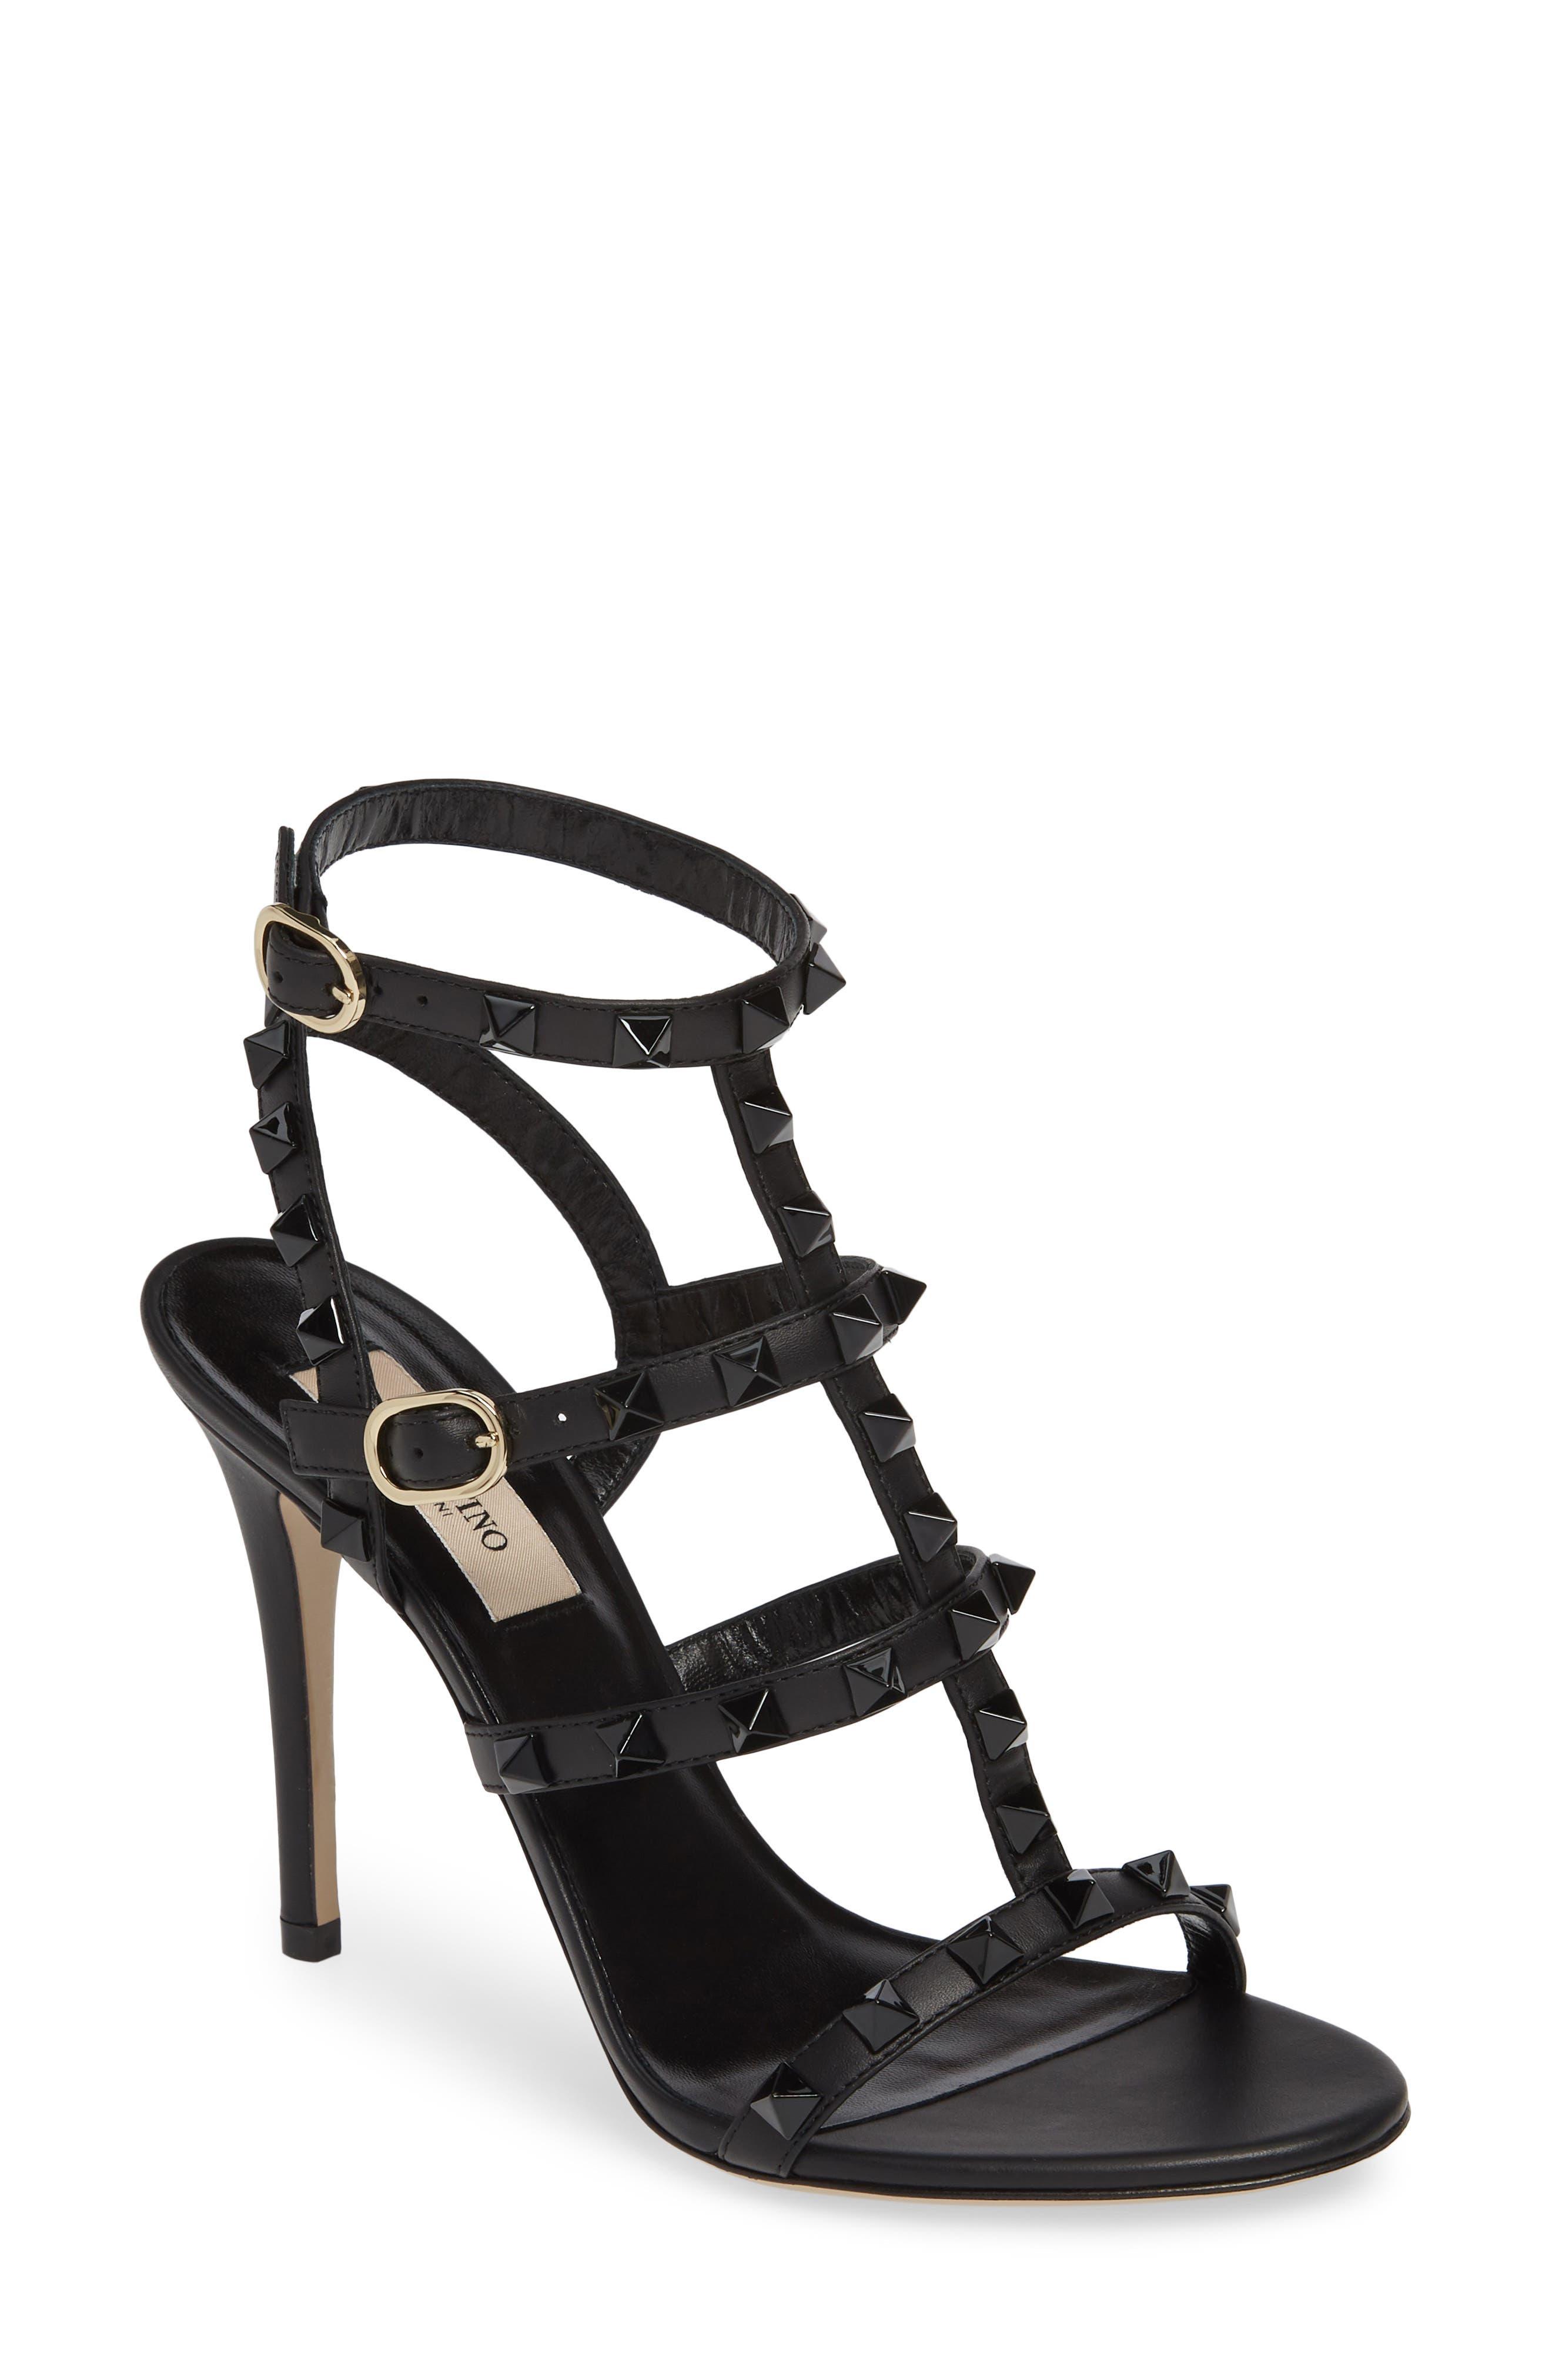 VALENTINO GARAVANI Rockstud T-Strap Sandal, Main, color, BLACK